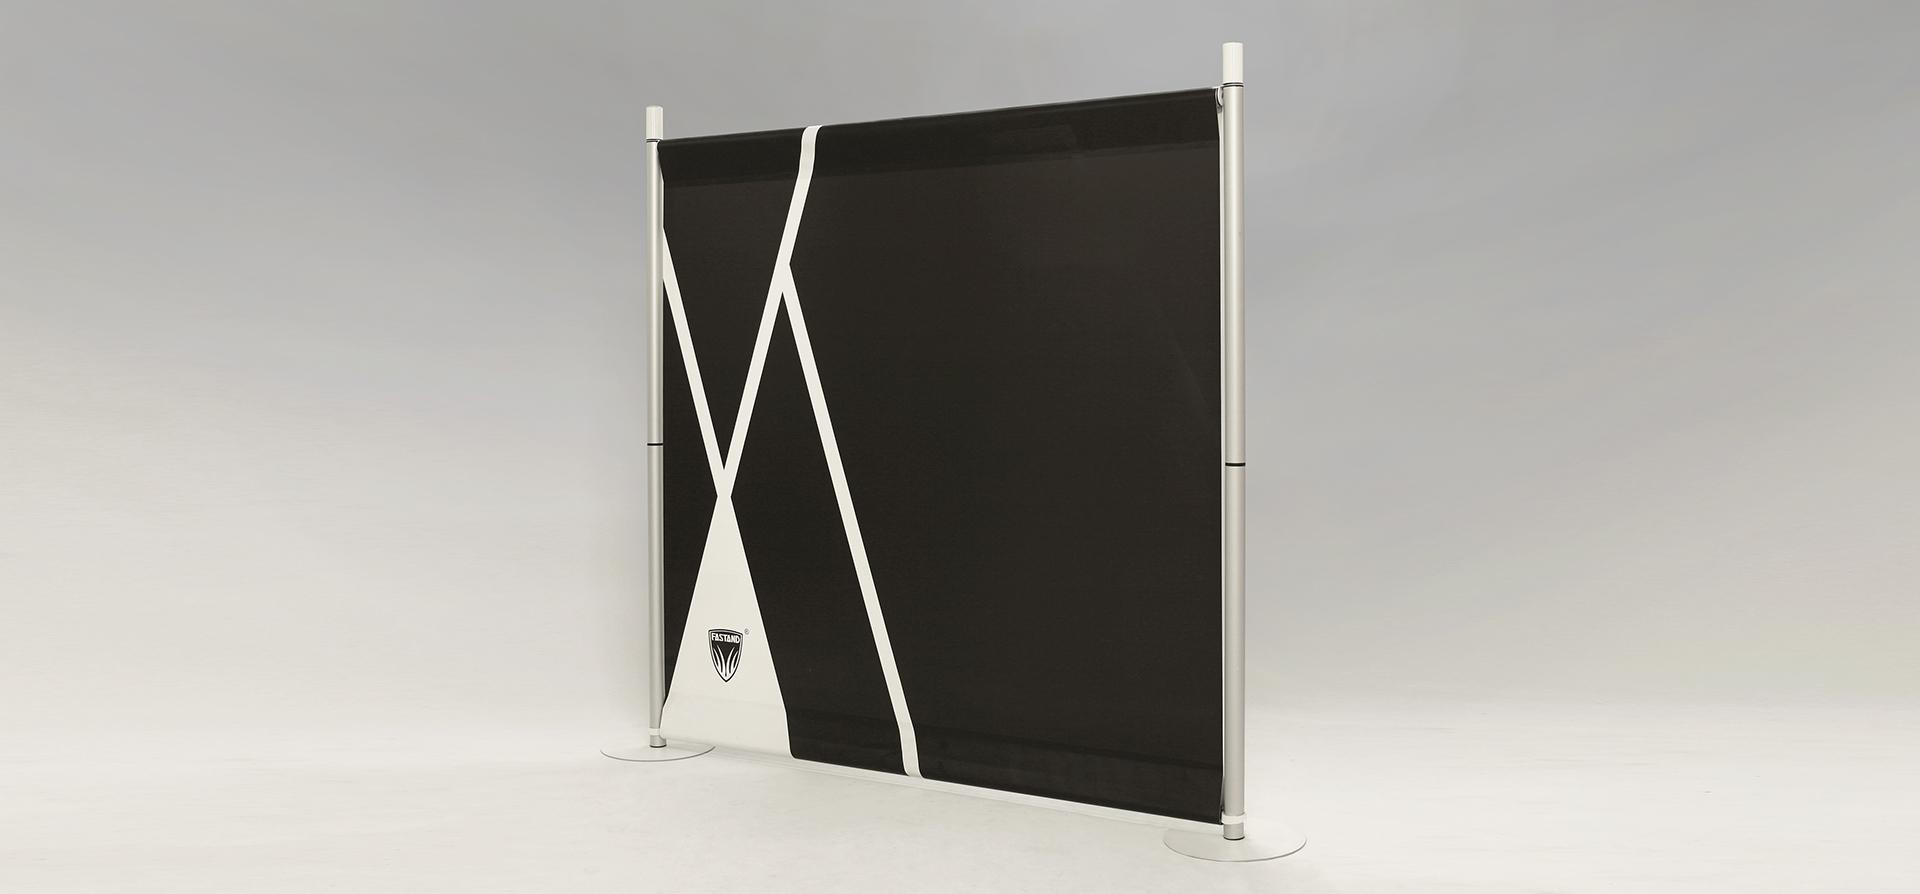 photocalls stand